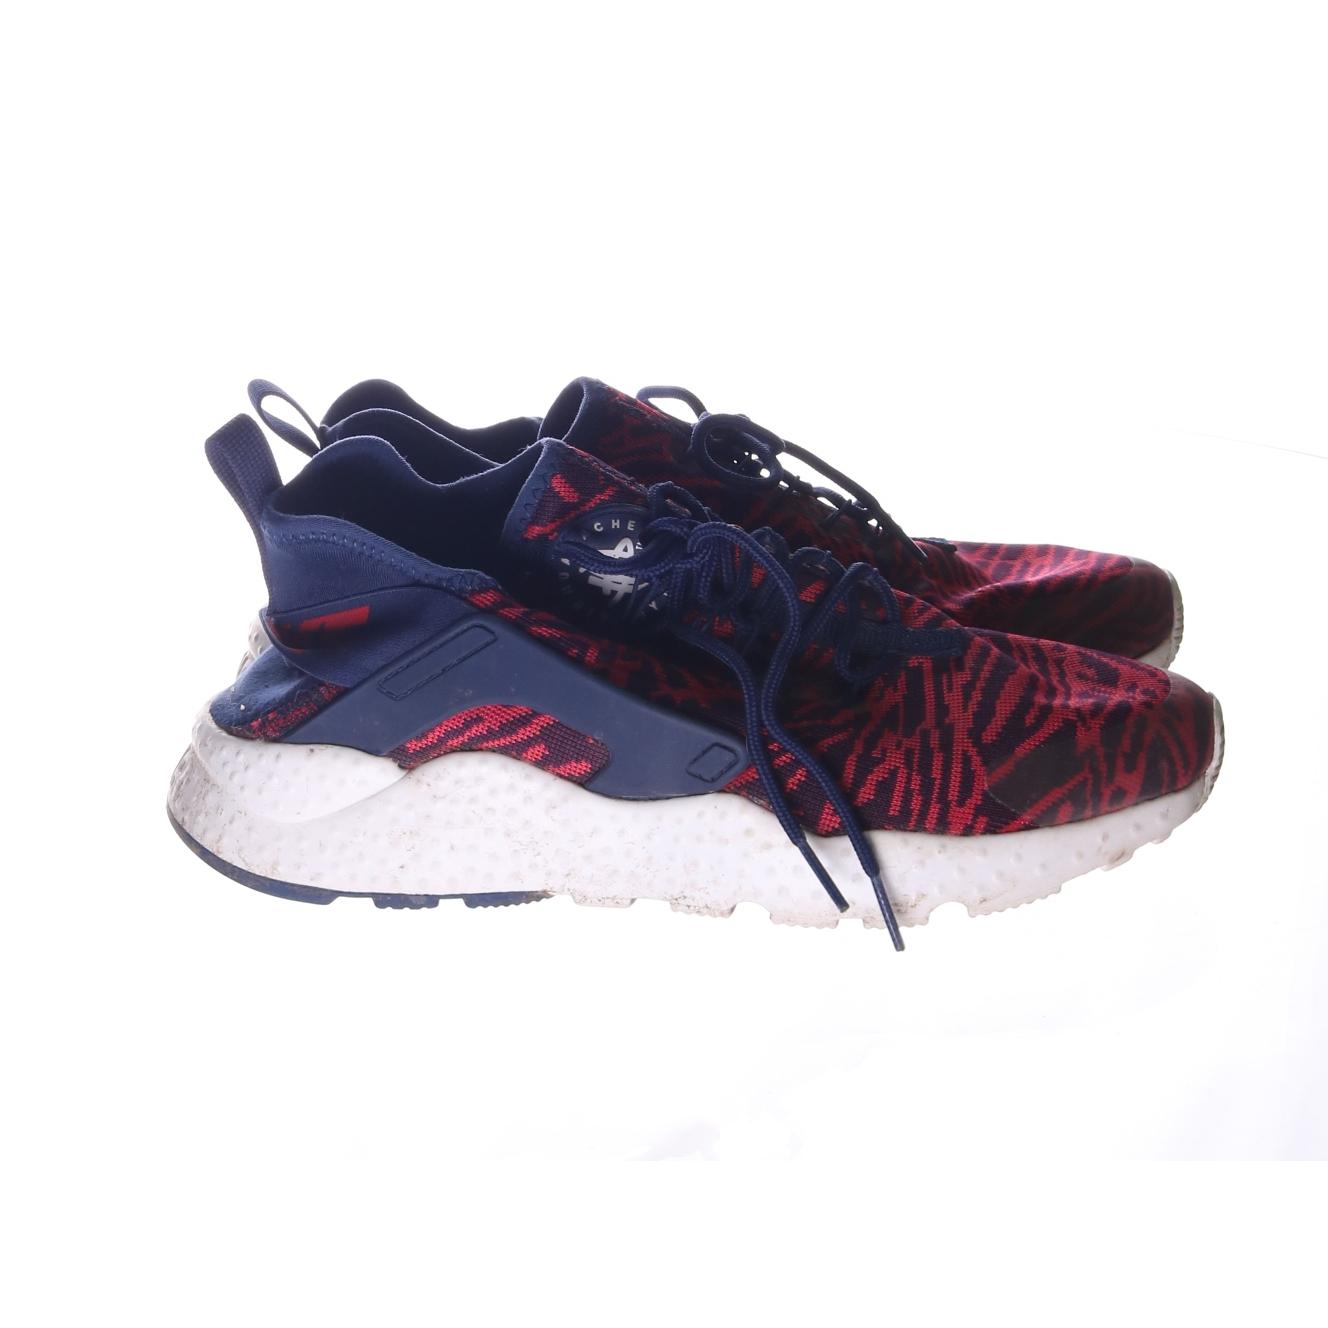 various colors 7bef5 16ea3 Sneakers (Air Huarache) från Nike   Sellpy.se